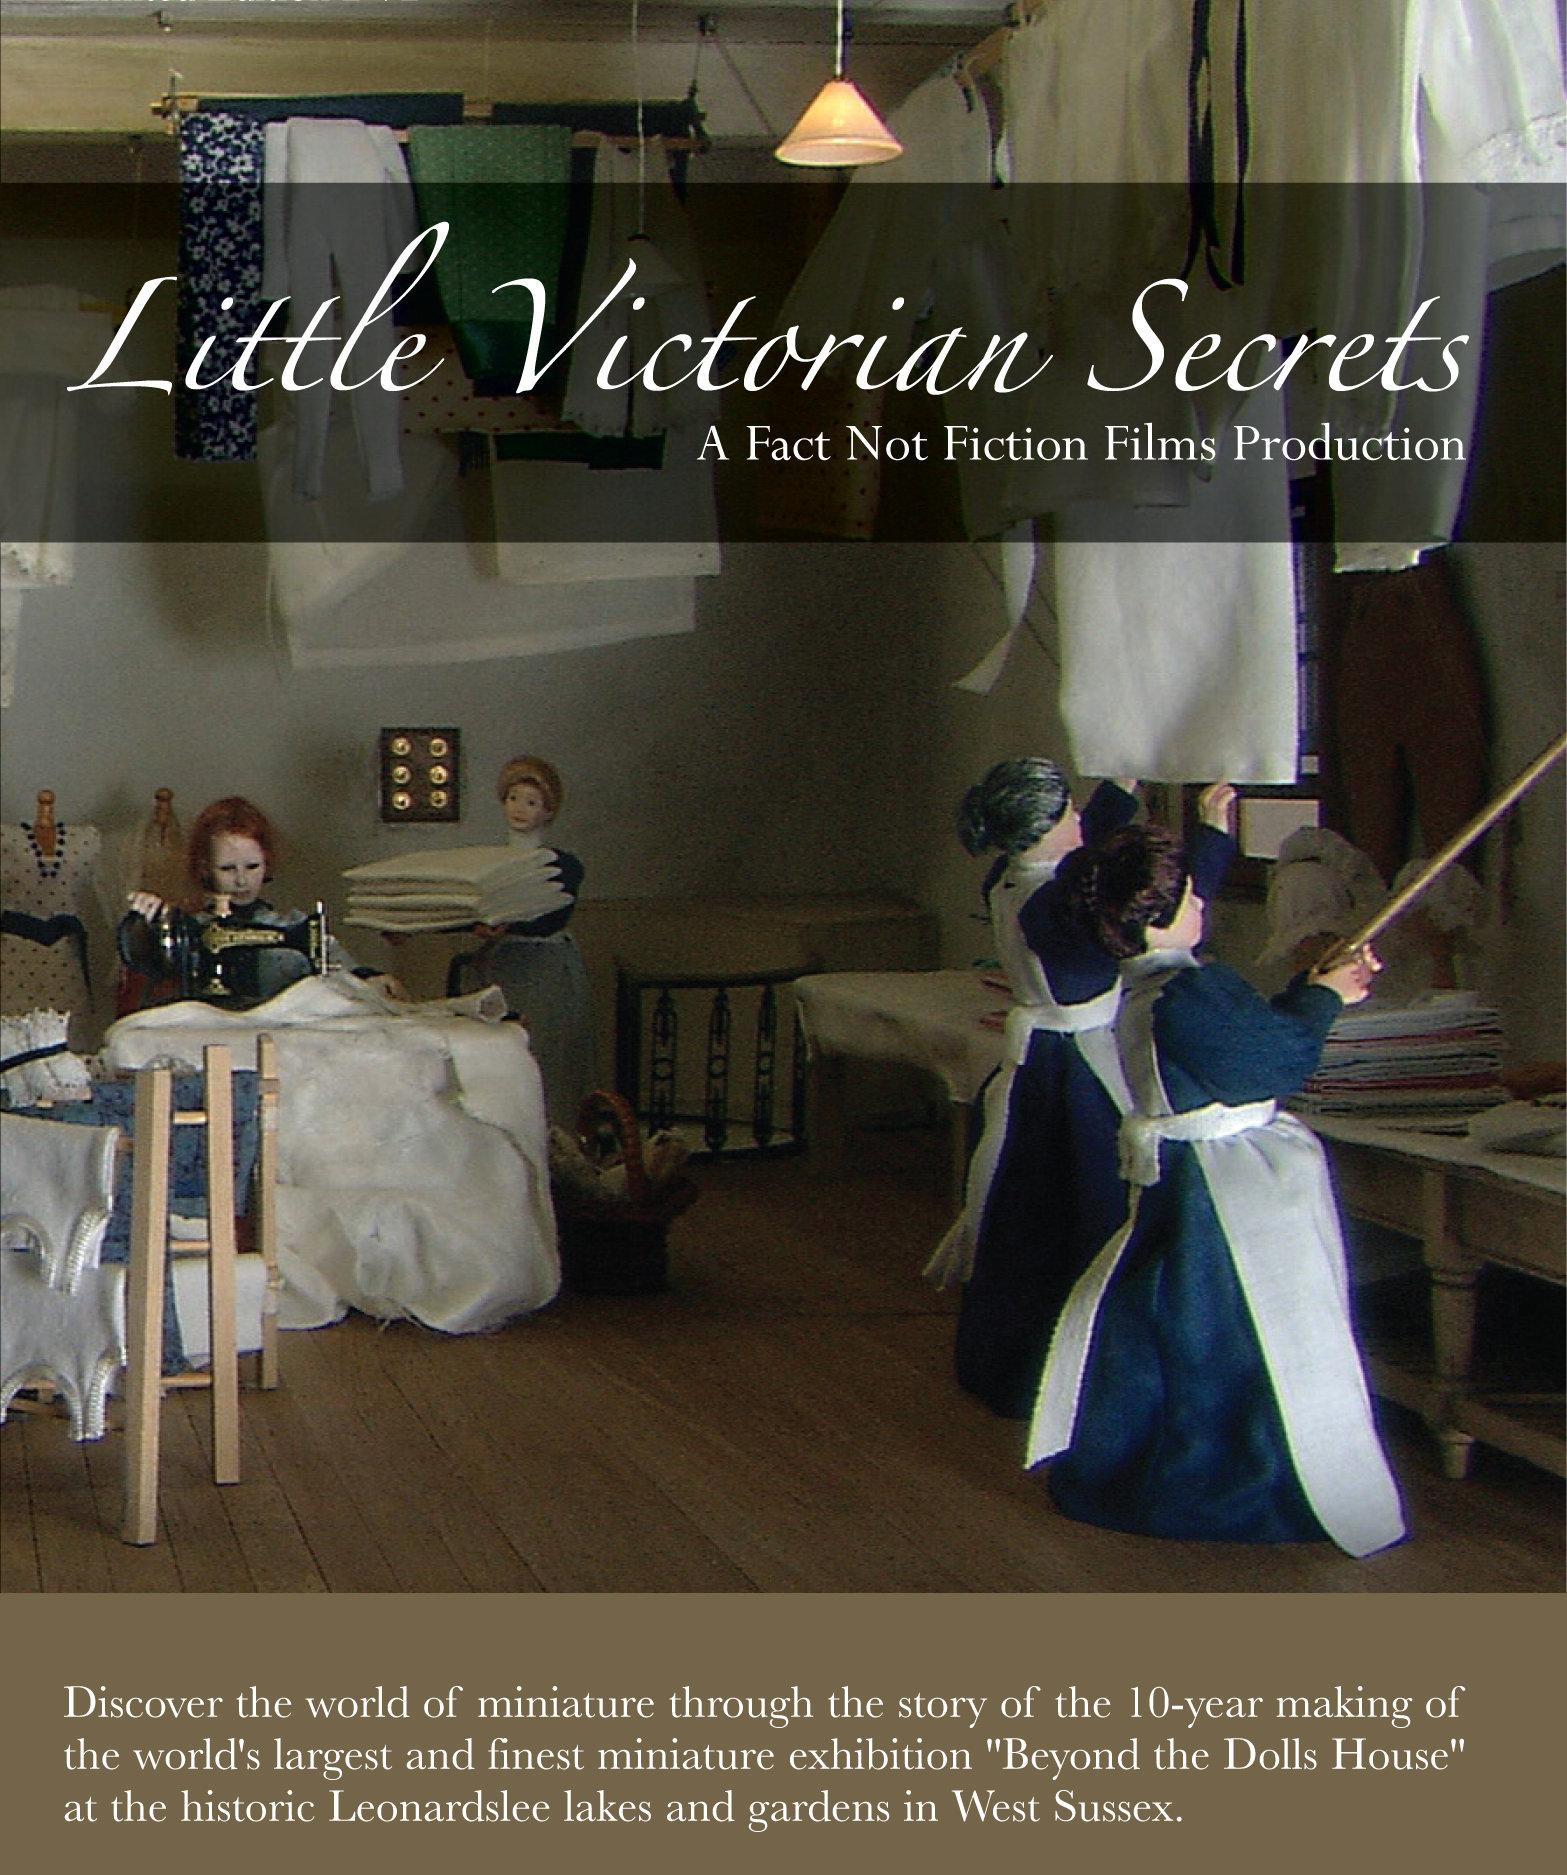 7170b8026 Little Victorian Secrets (2010) - IMDb